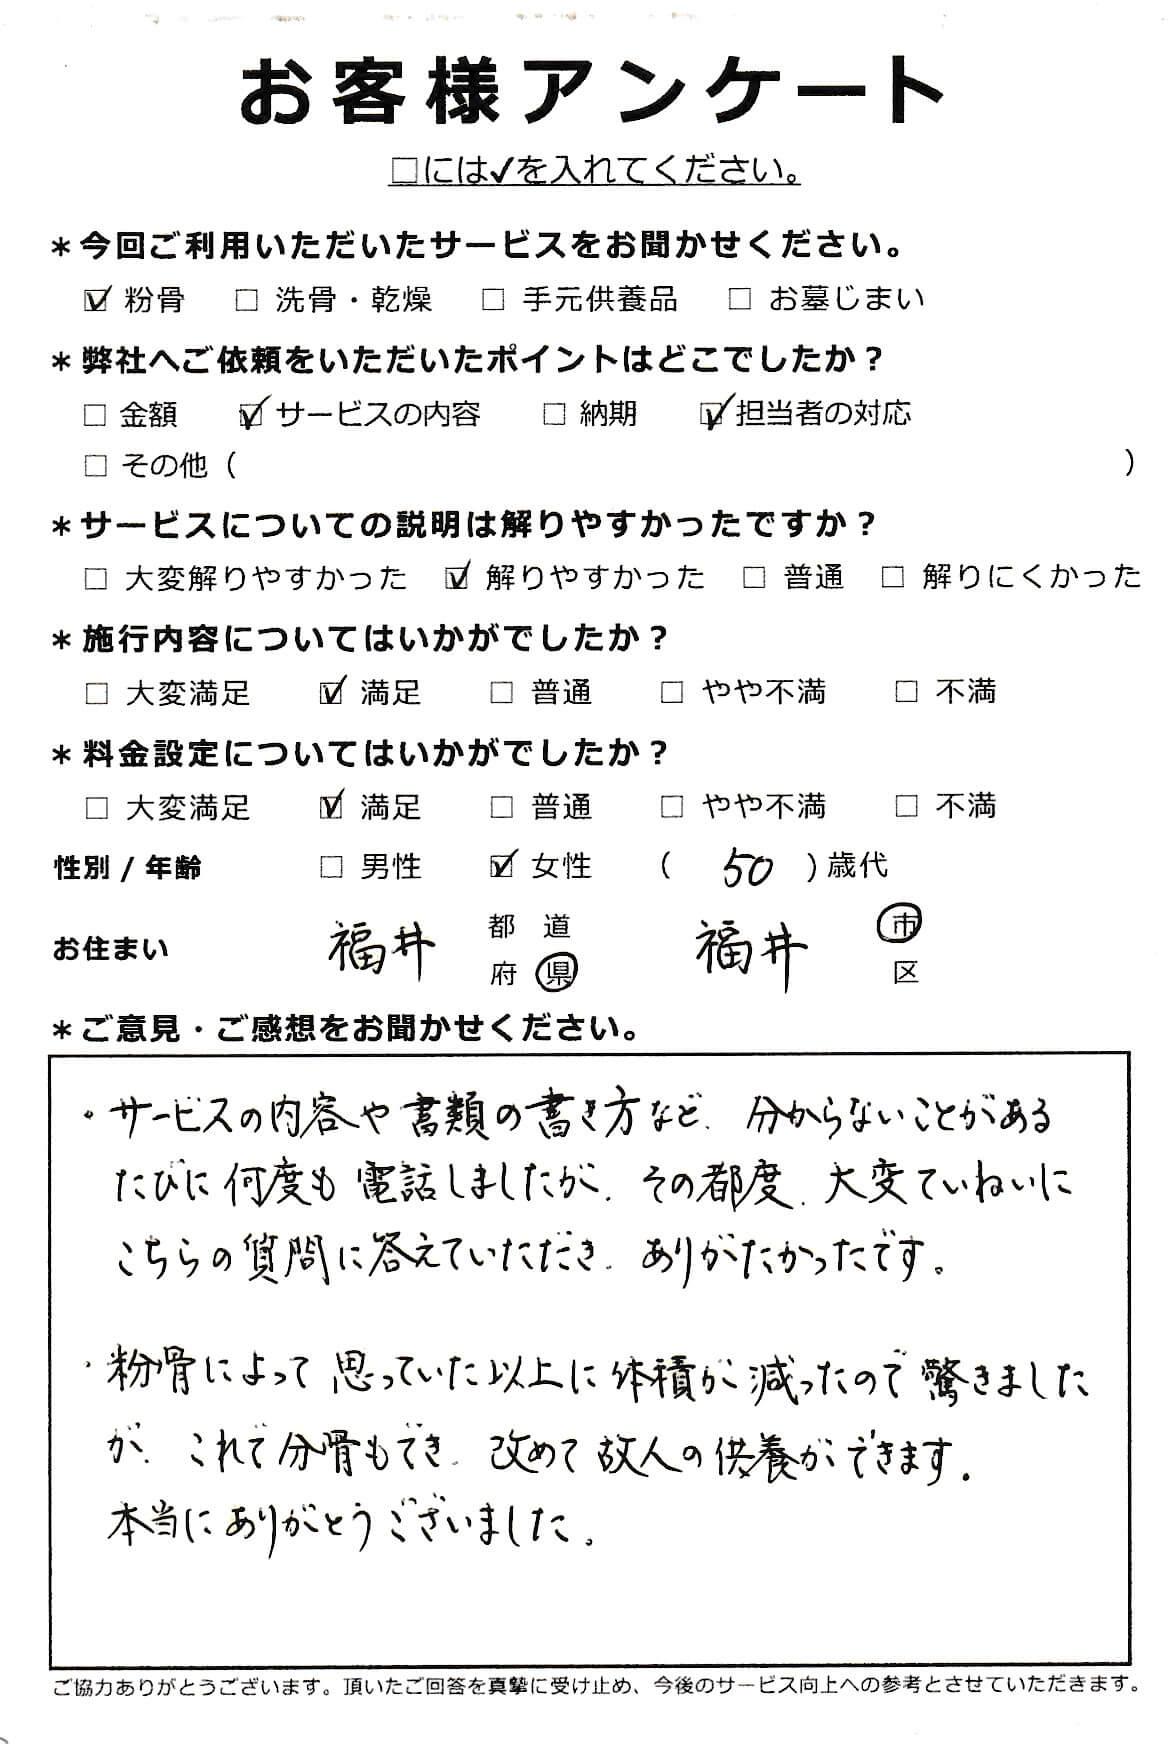 福井県福井市での粉骨サービス